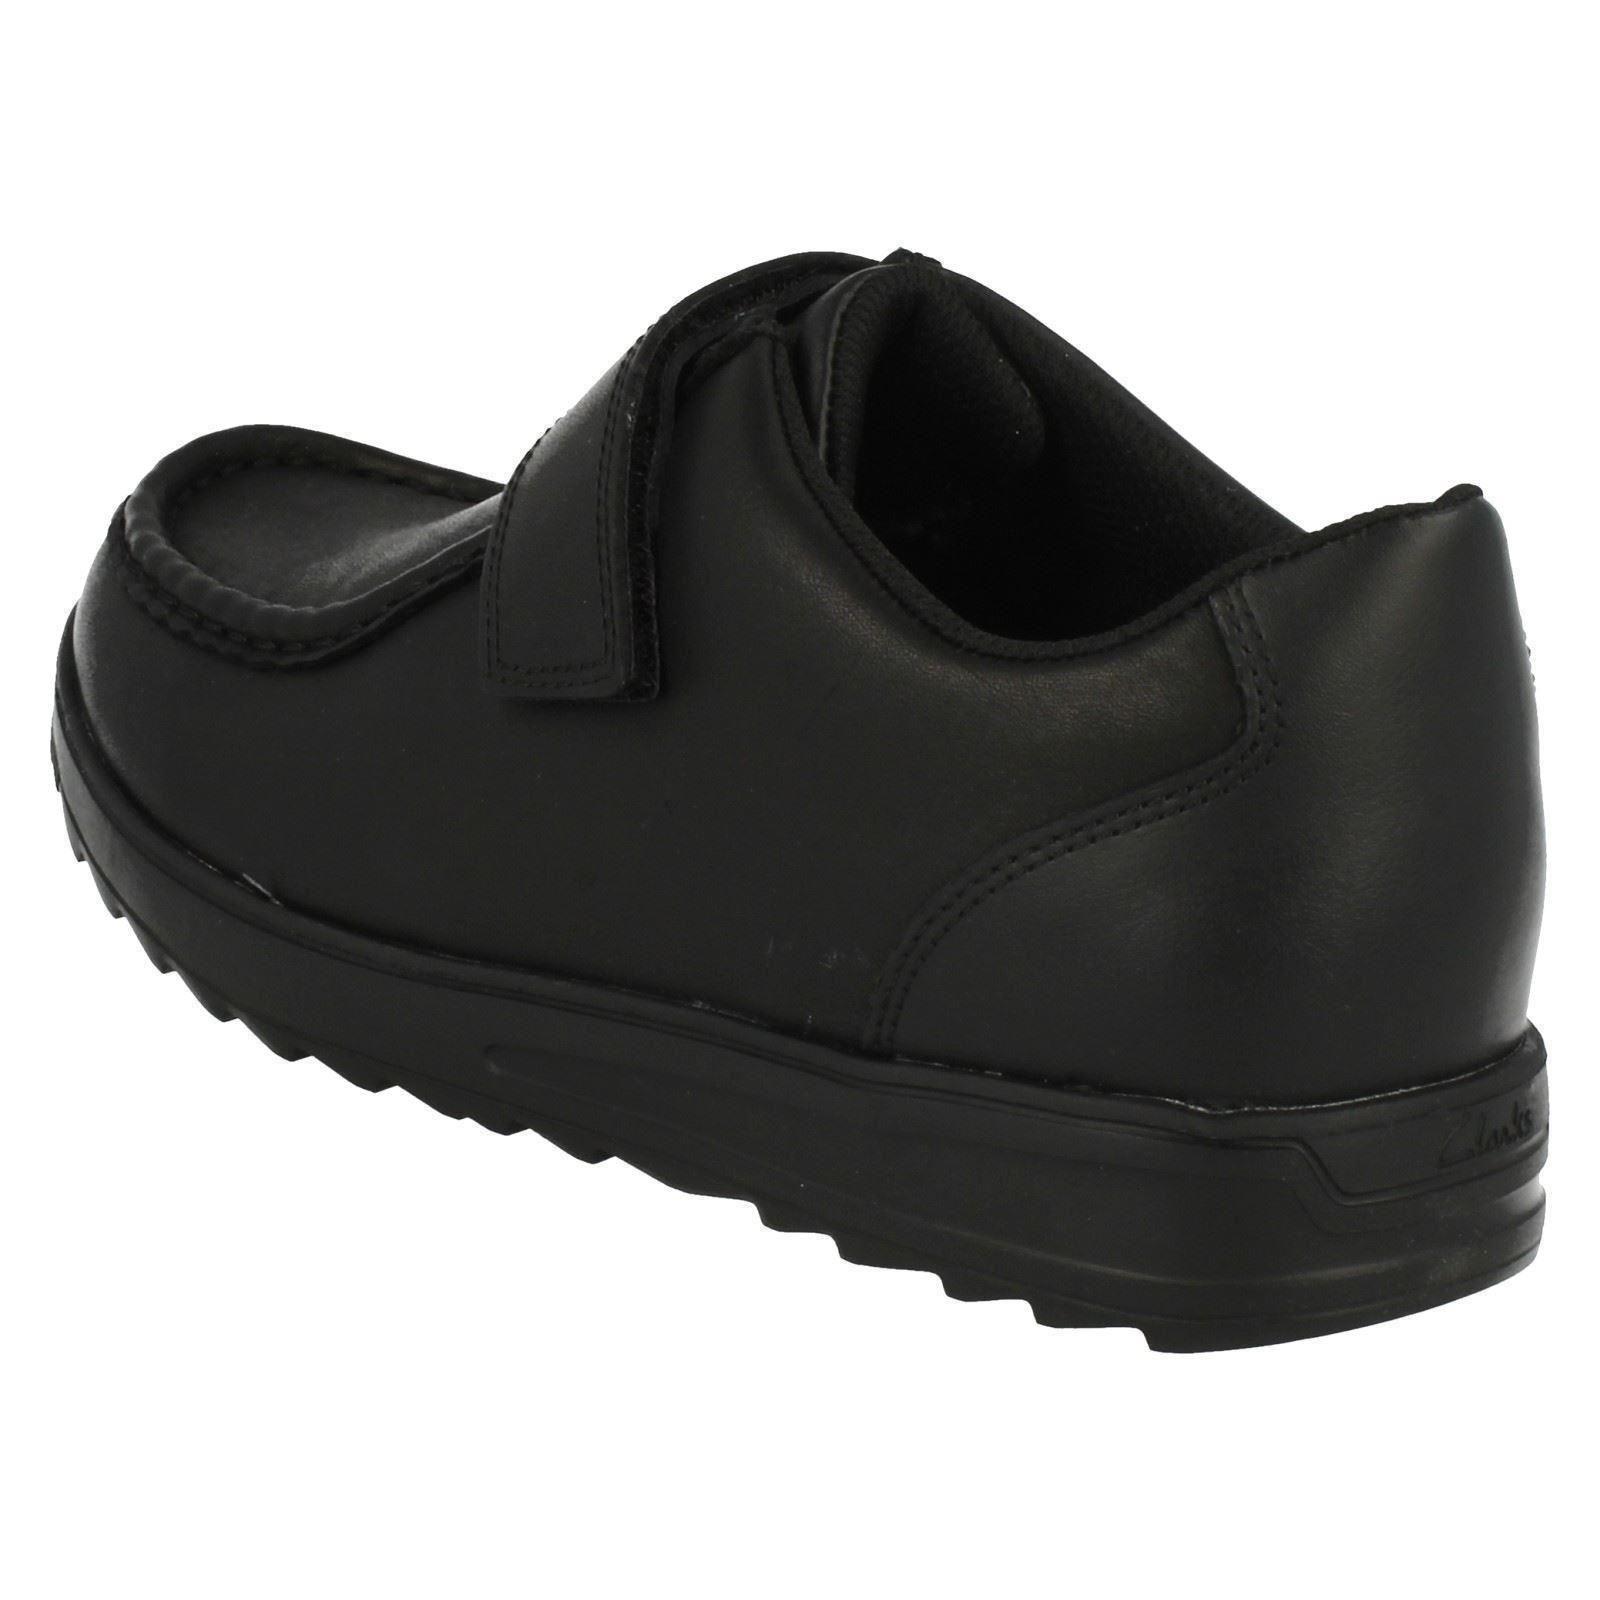 Chaqueta Shoes Gate' By 'mistro School Clarks pirata Black IxfFwIr6q